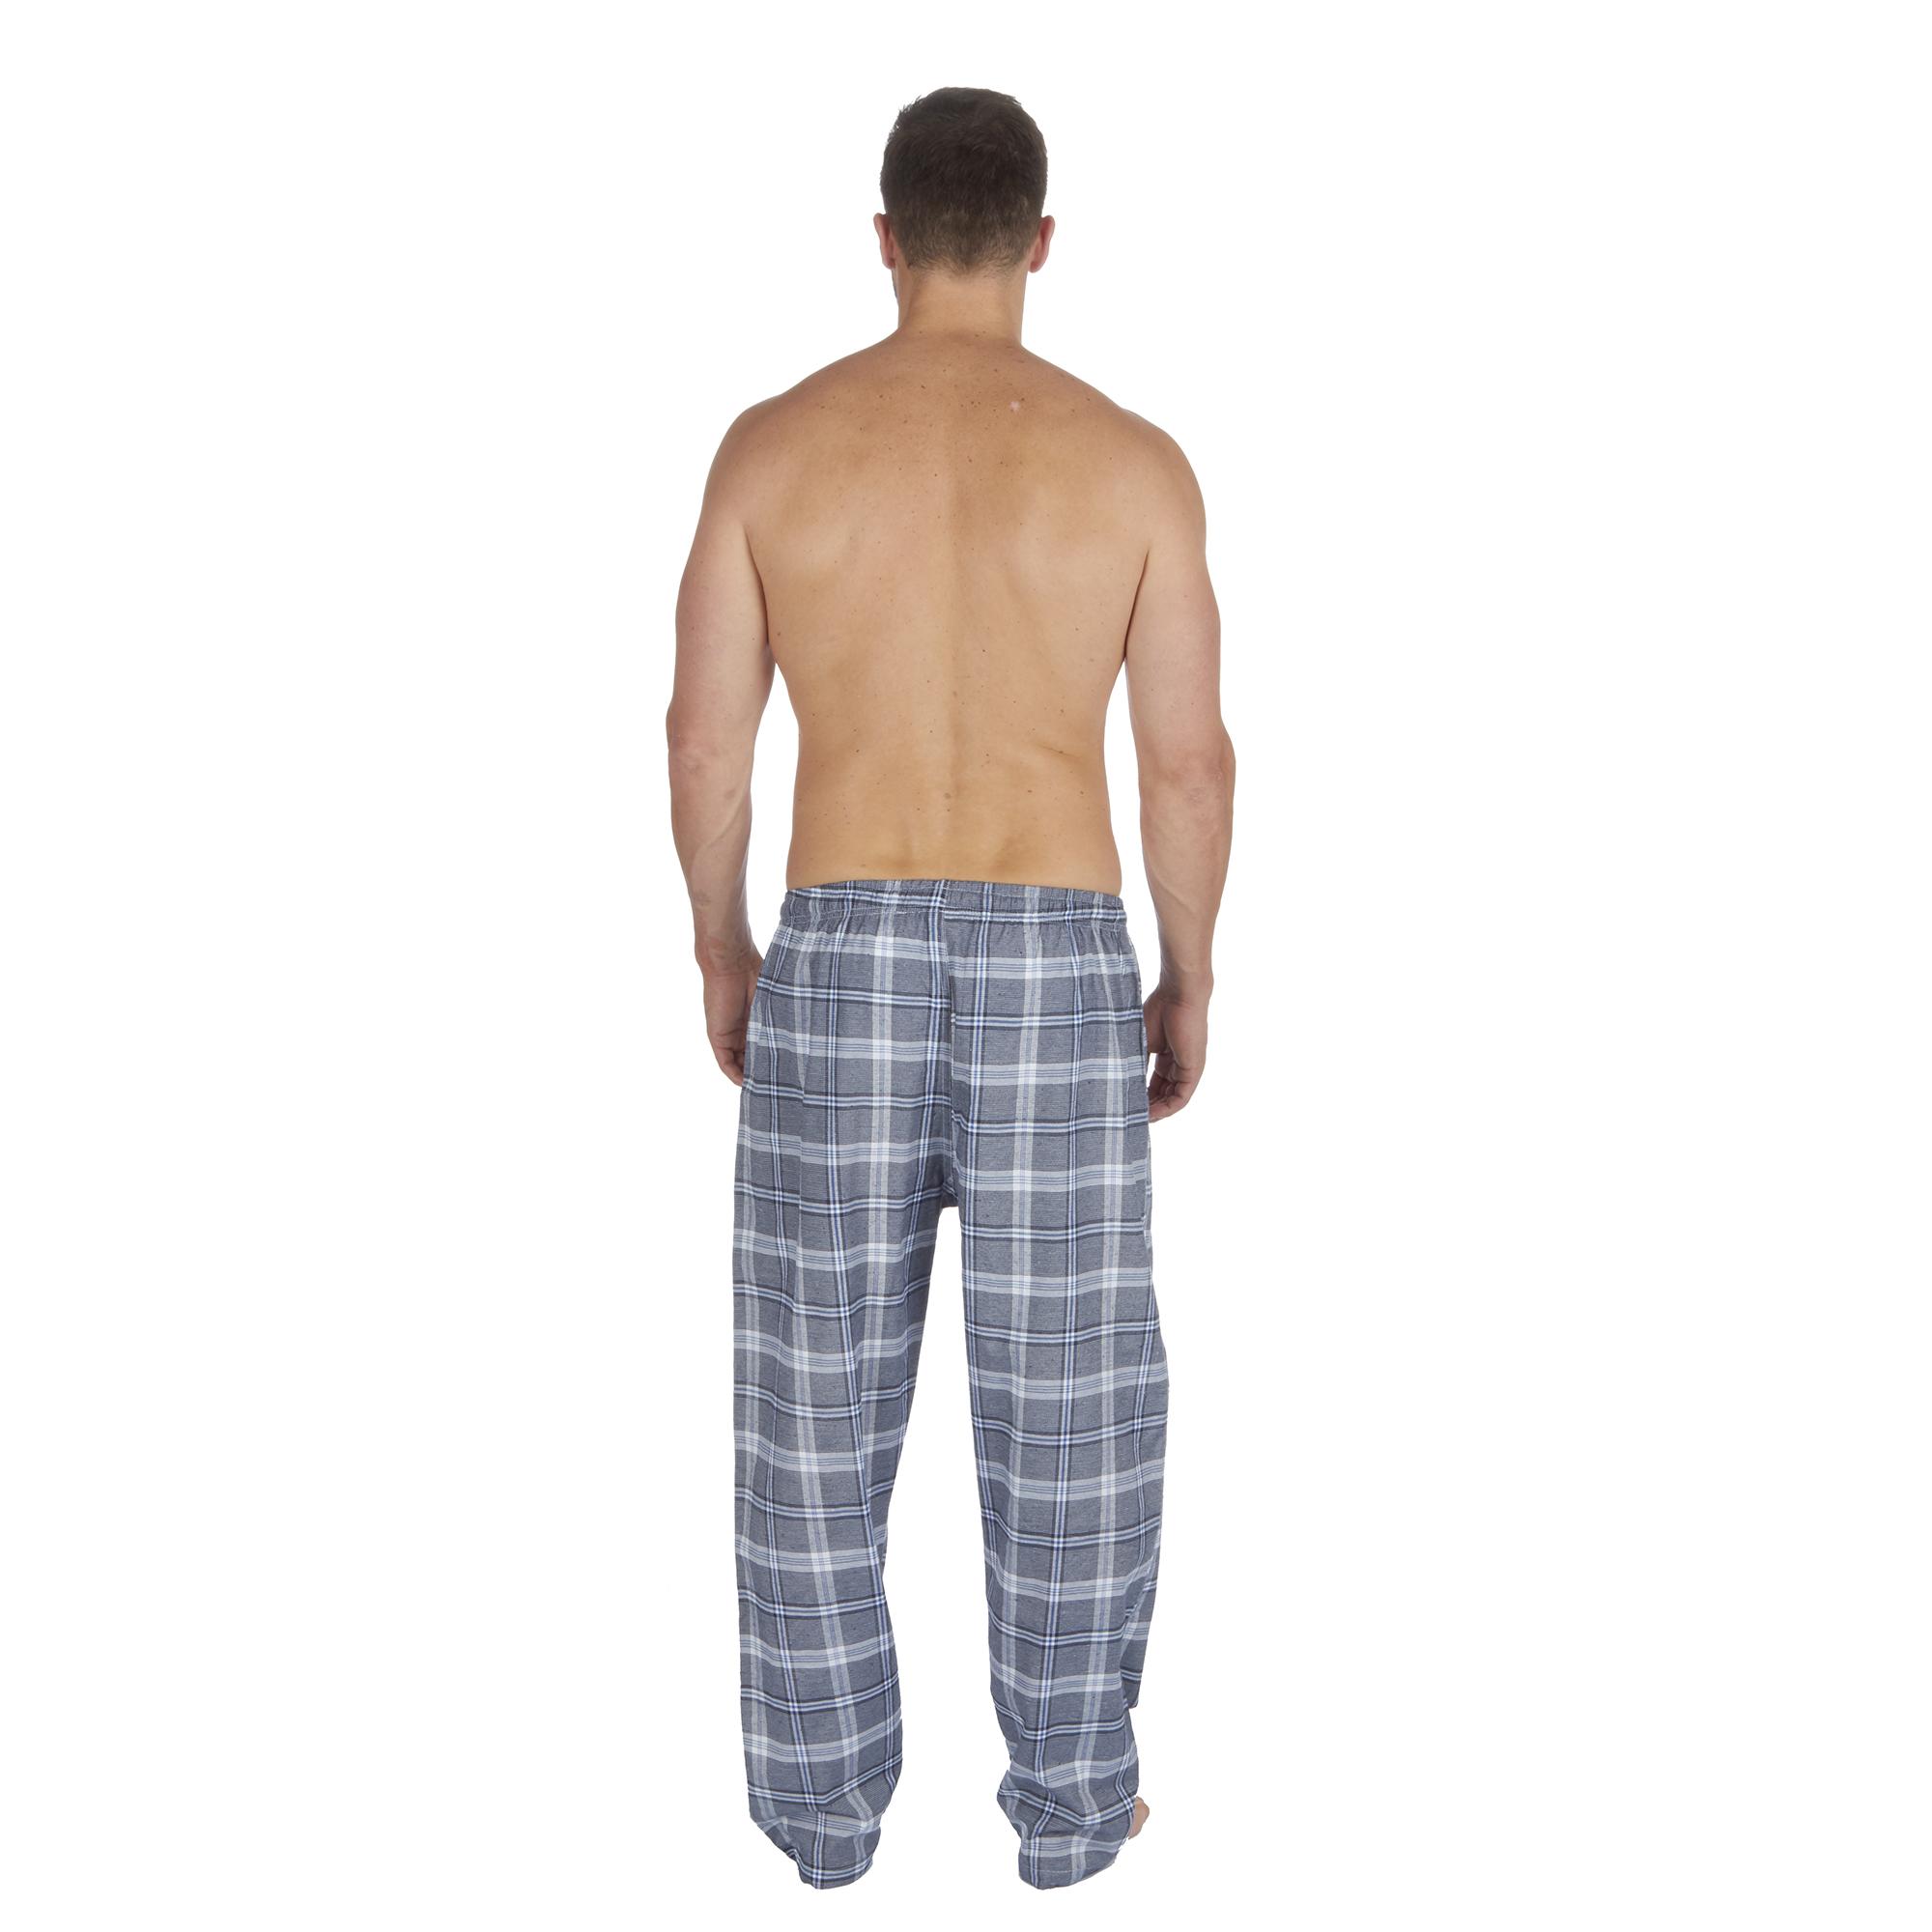 Jason-Jones-Homme-Carreaux-Tisse-Pyjama-Pantalon-en-Coton-Melange-Serge-PJ-Lounge-Pants miniature 16